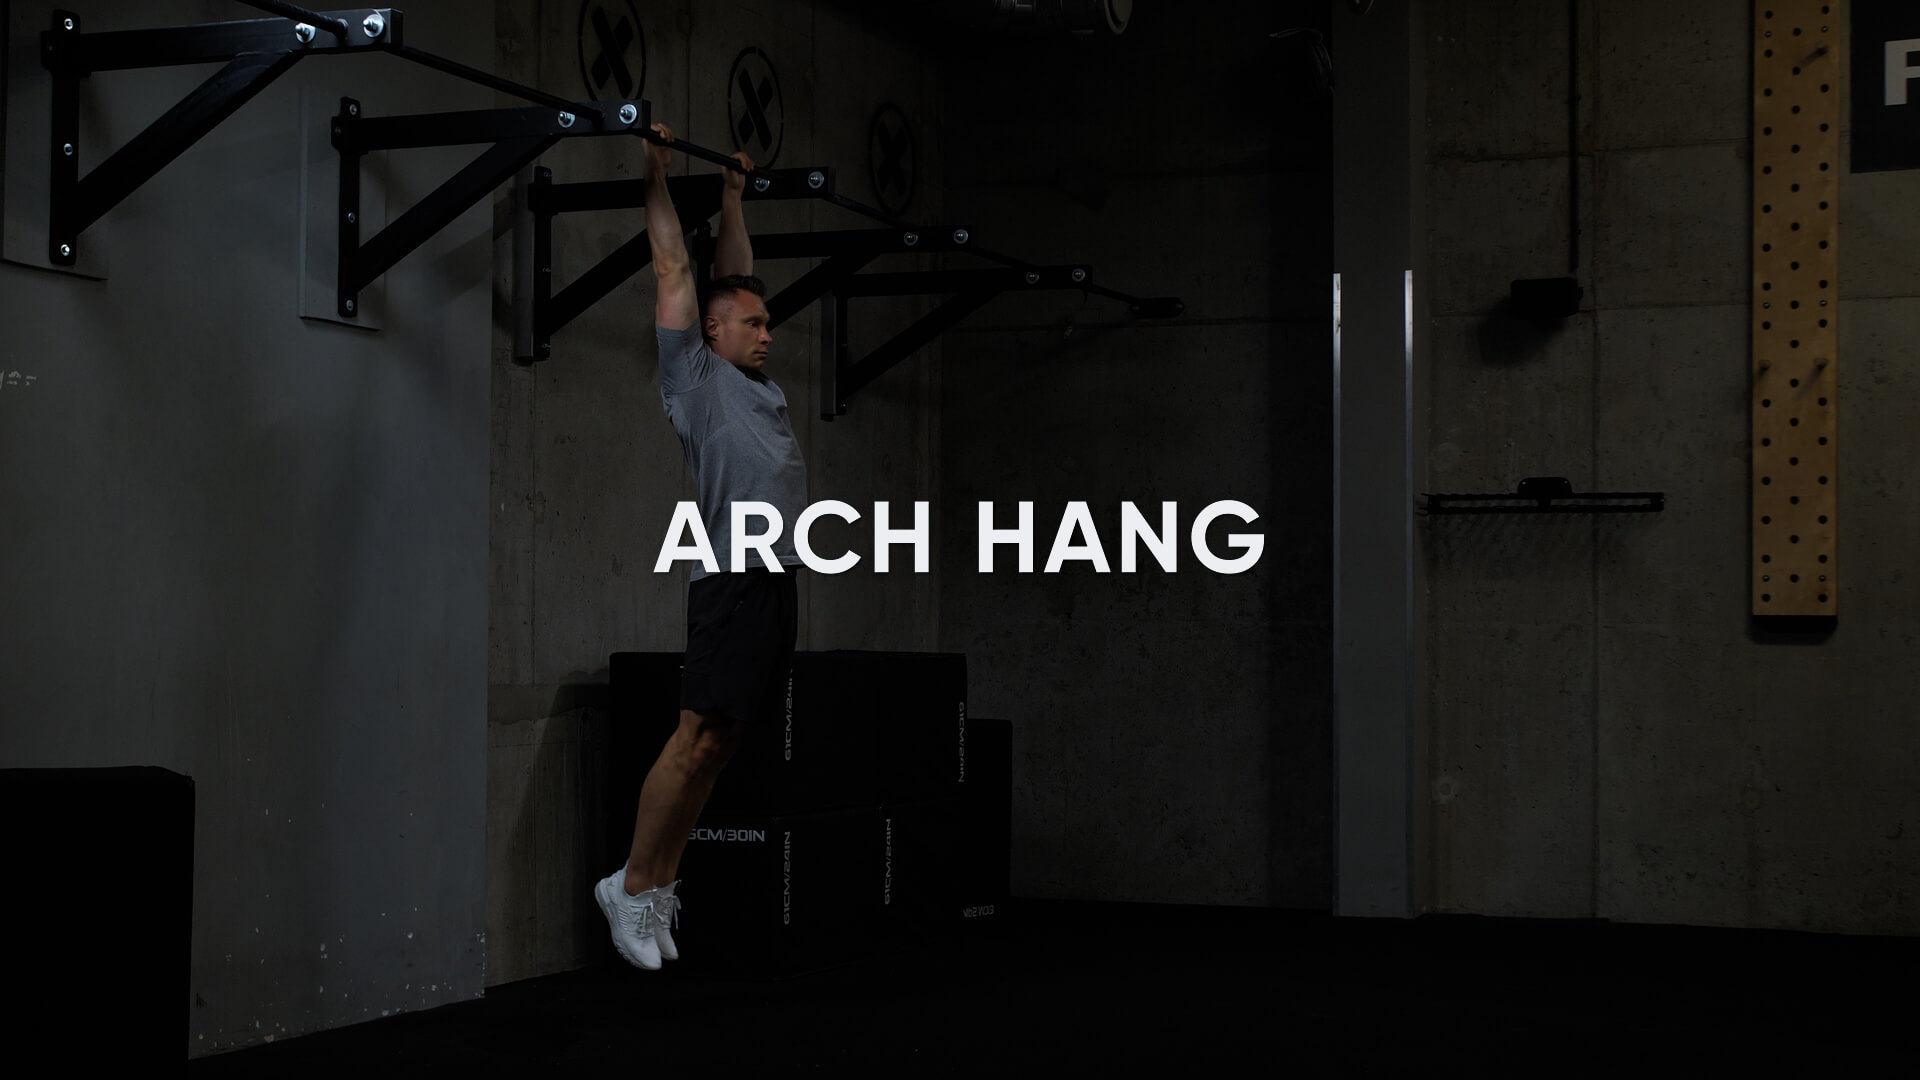 Arch Hang